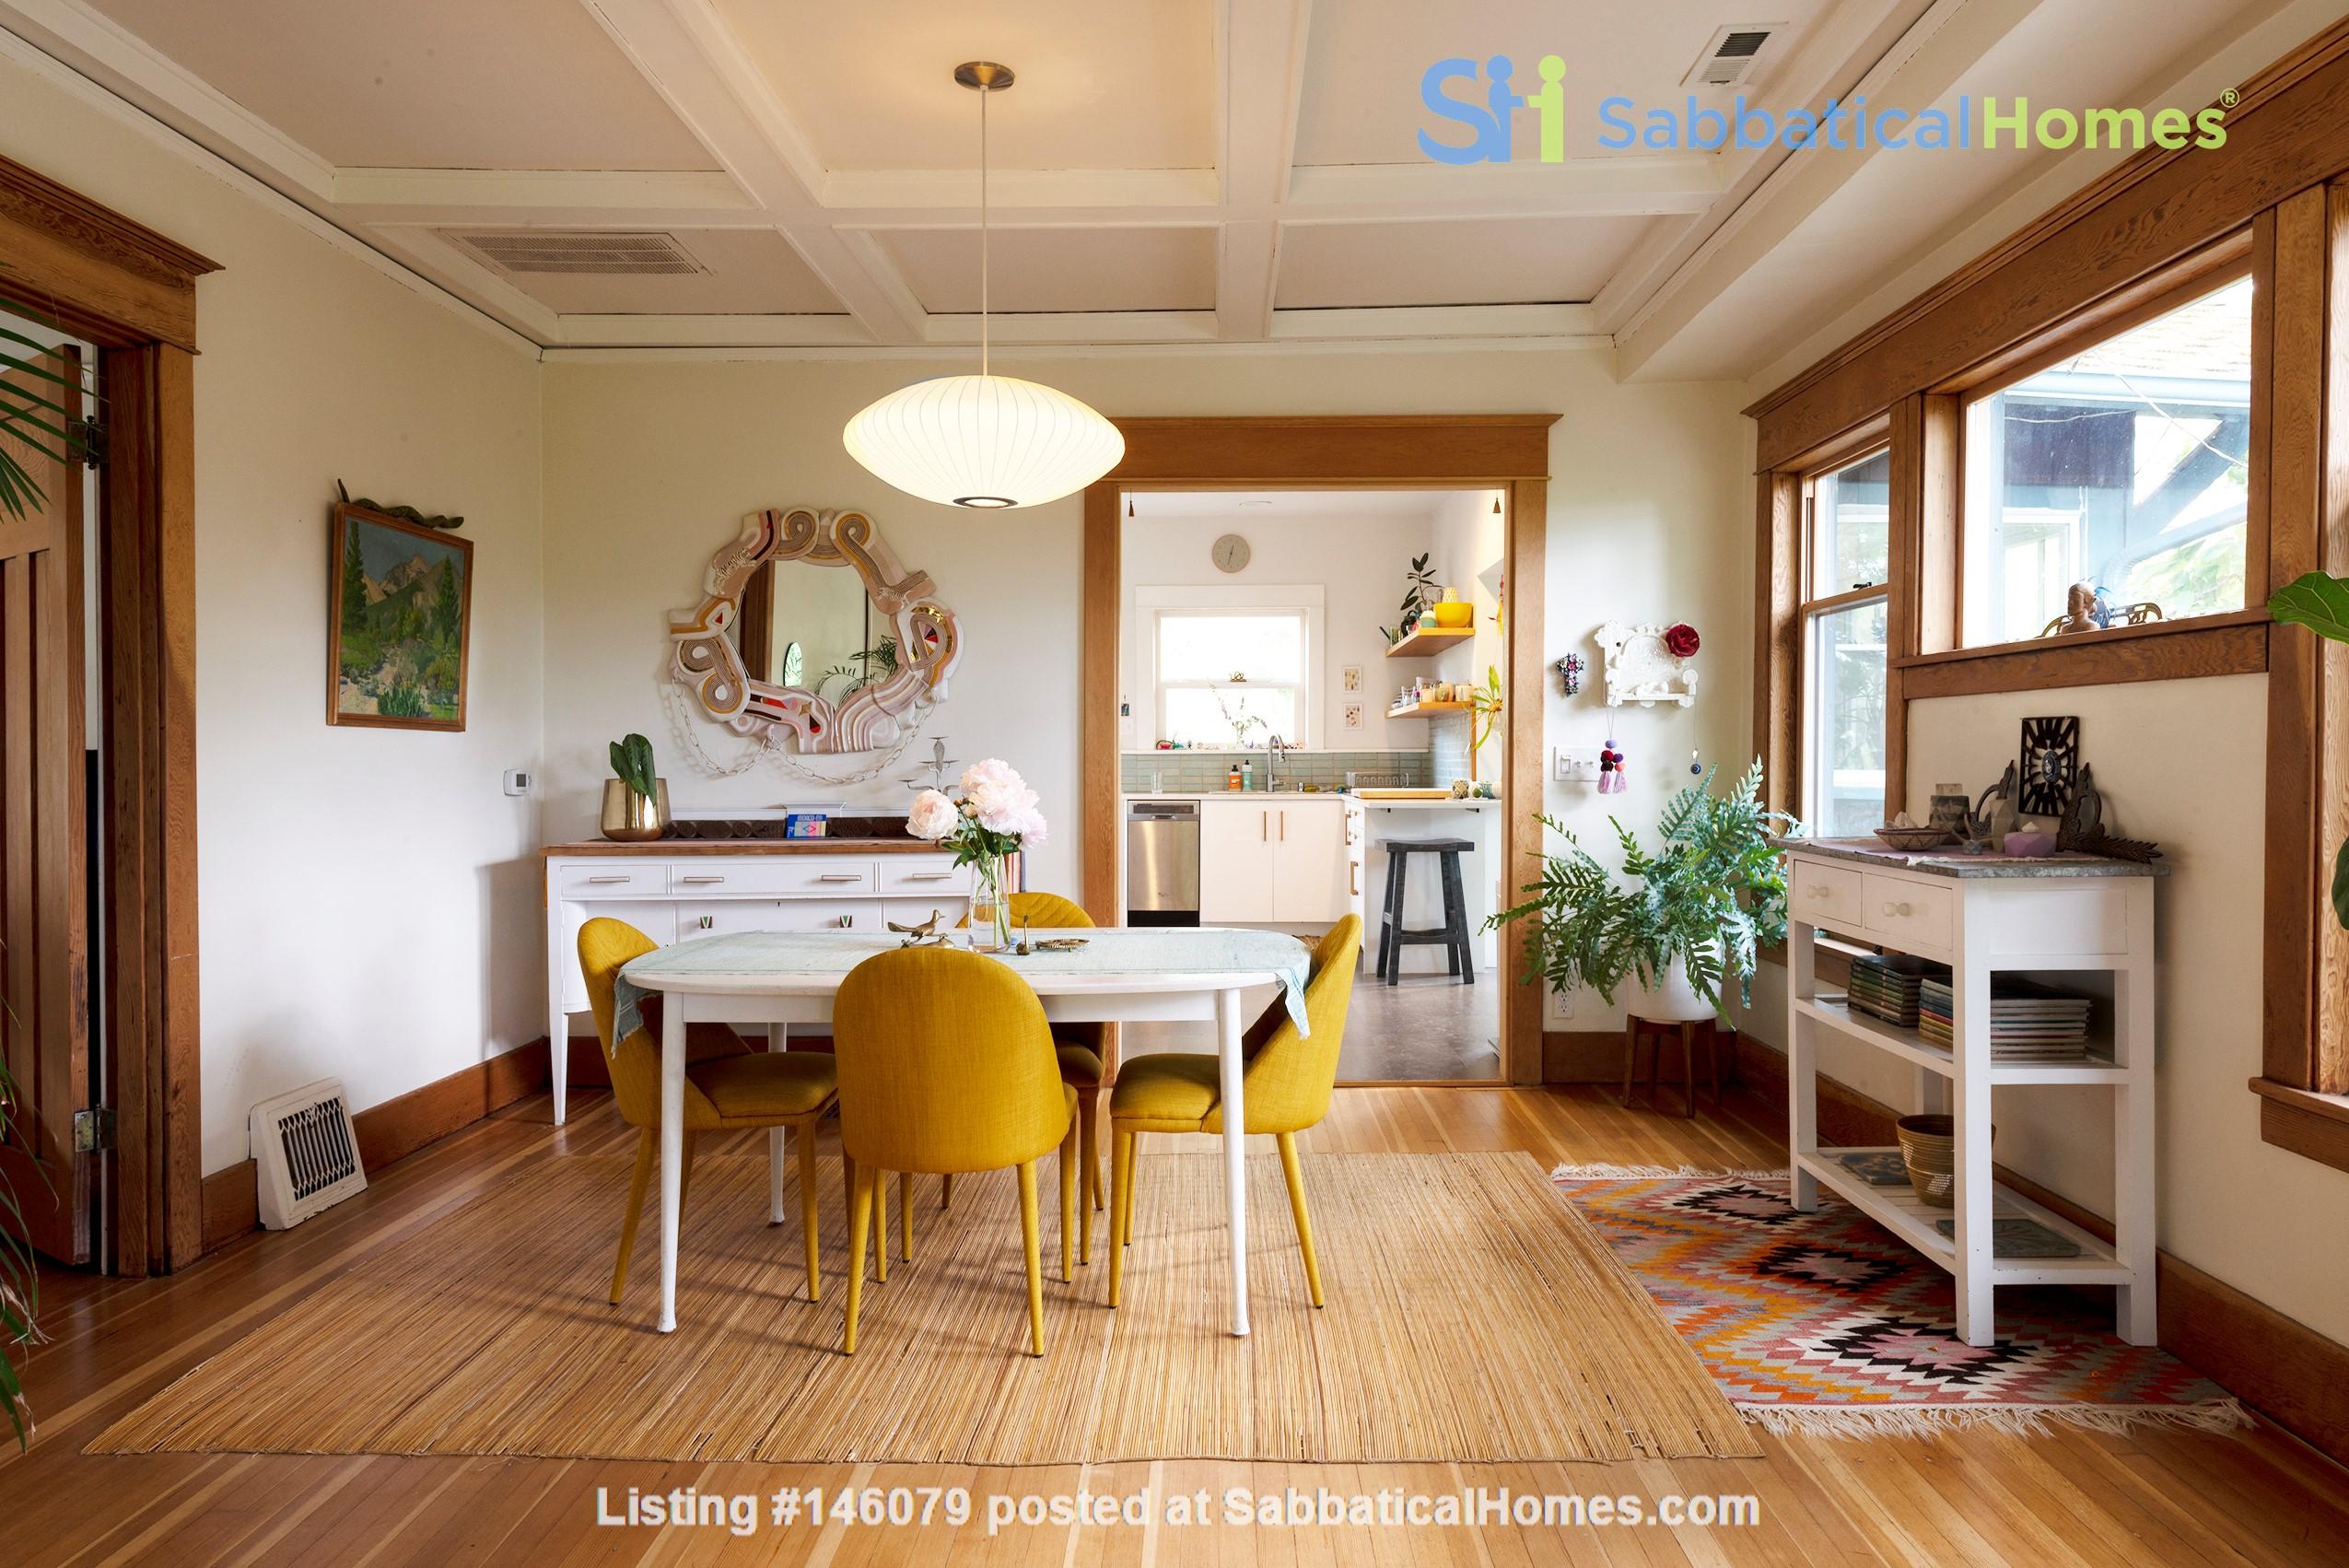 Scandinavian Queen Anne Home Home Rental in Seattle 0